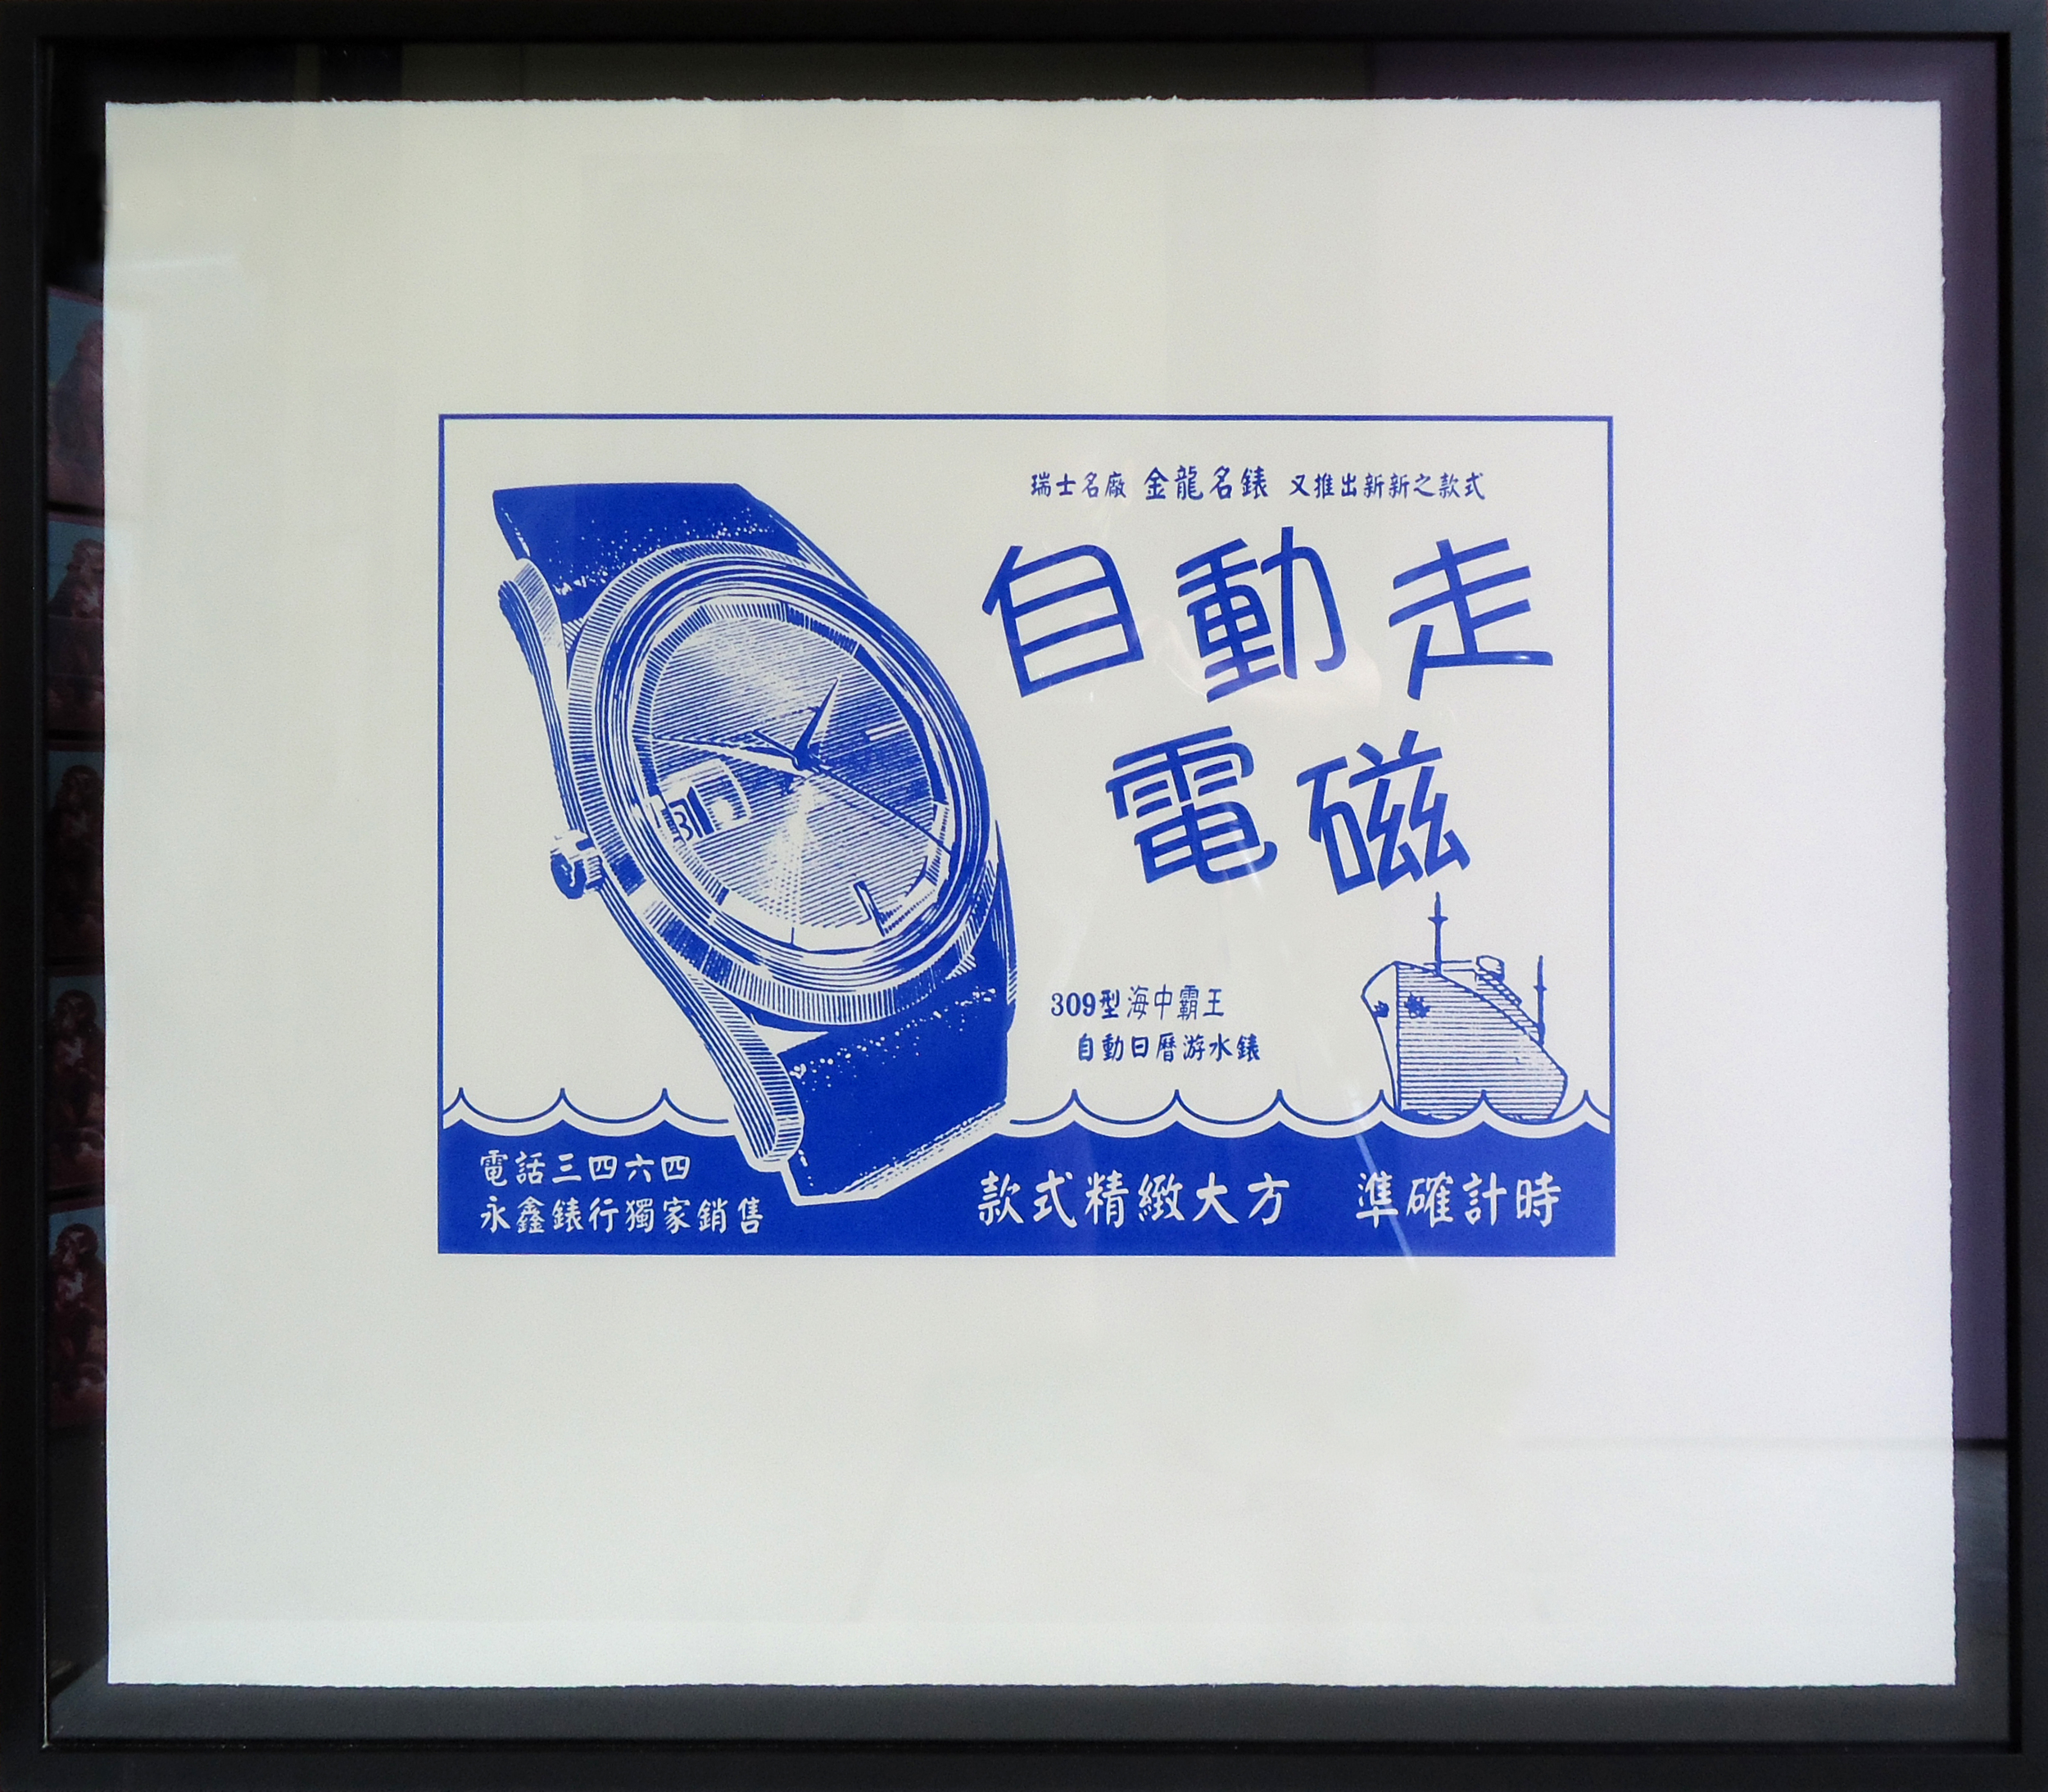 自动走电池 (Zhi Dong Kia Dian Thor)